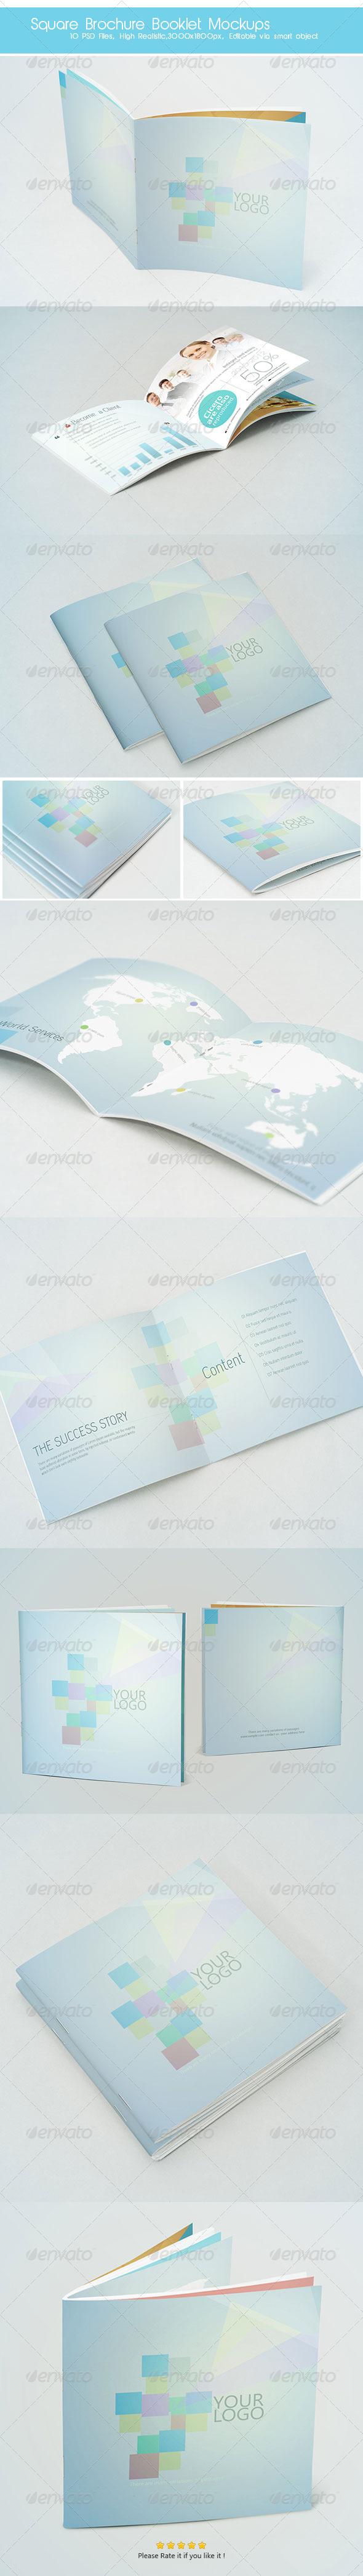 GraphicRiver Square Brochure Booklet Mockups 7089792